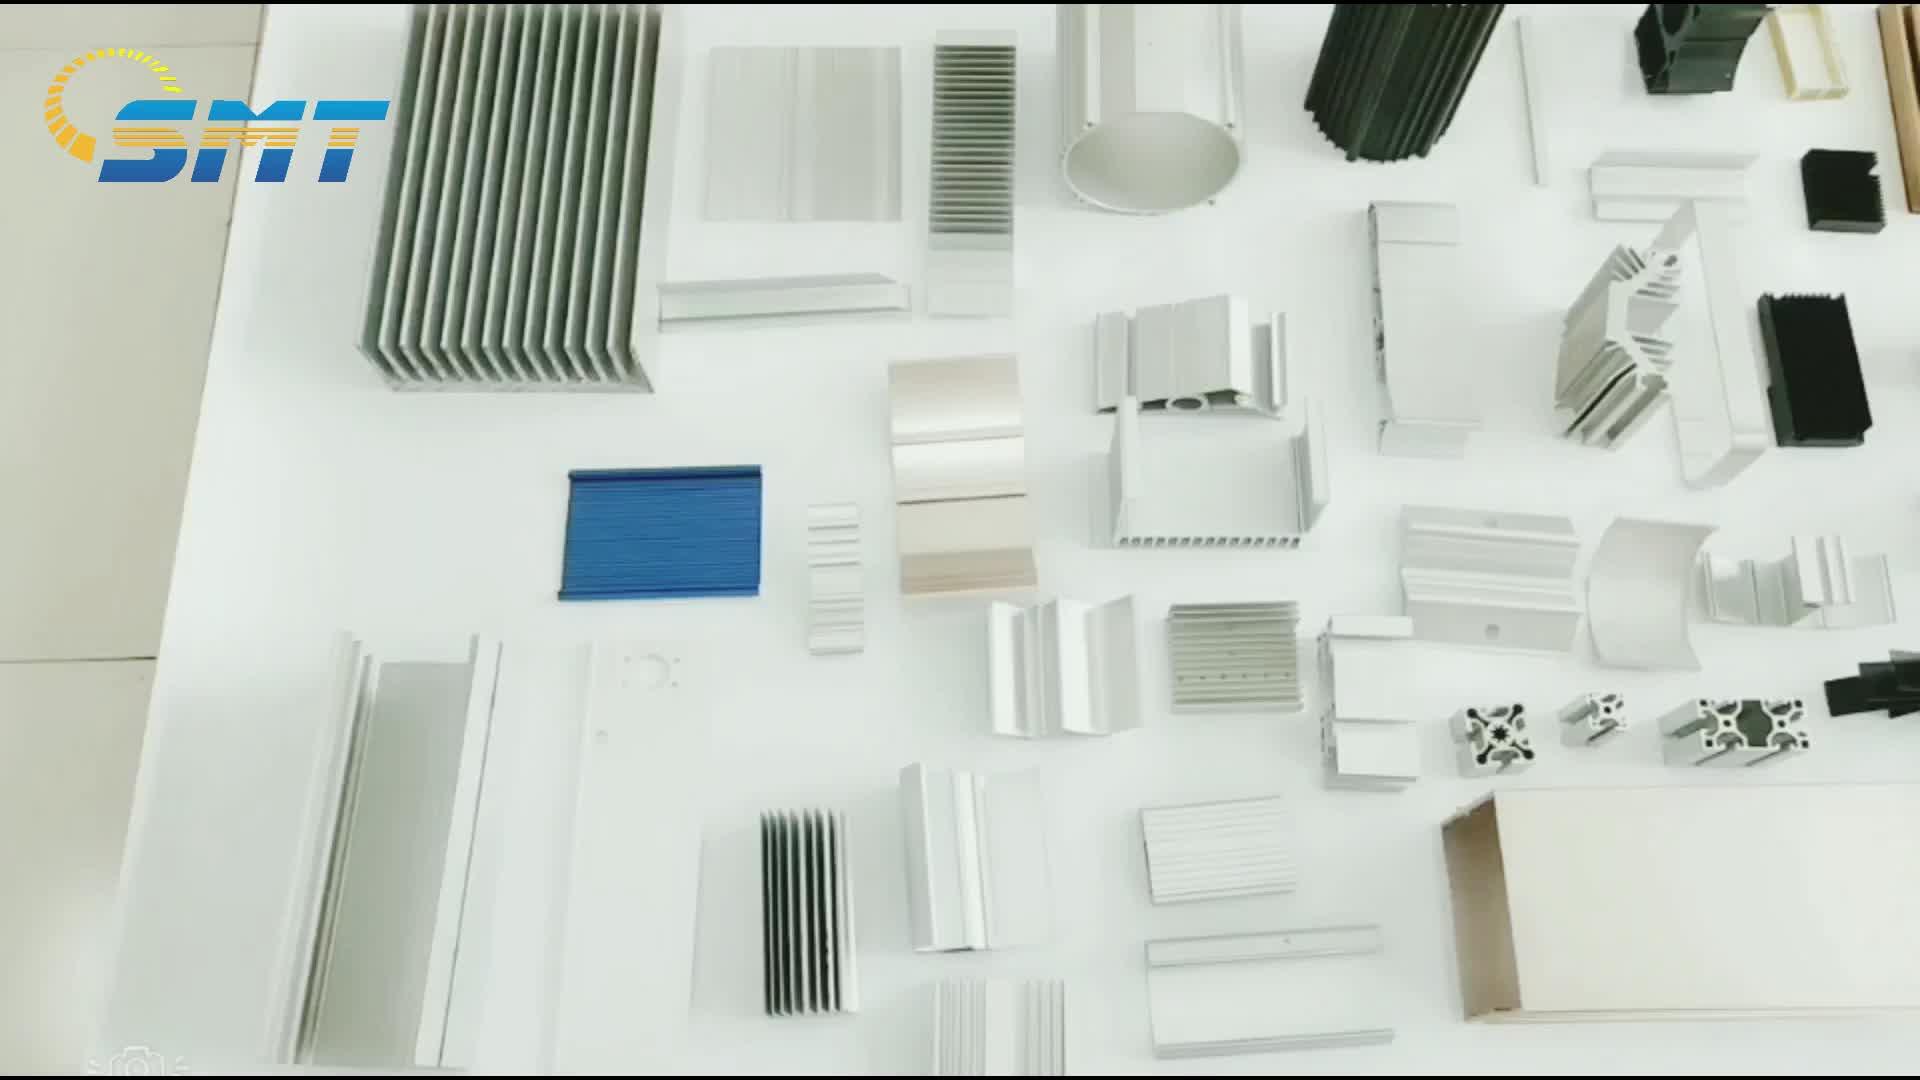 Custom precision aluminum cnc turning parts parts milling/turning